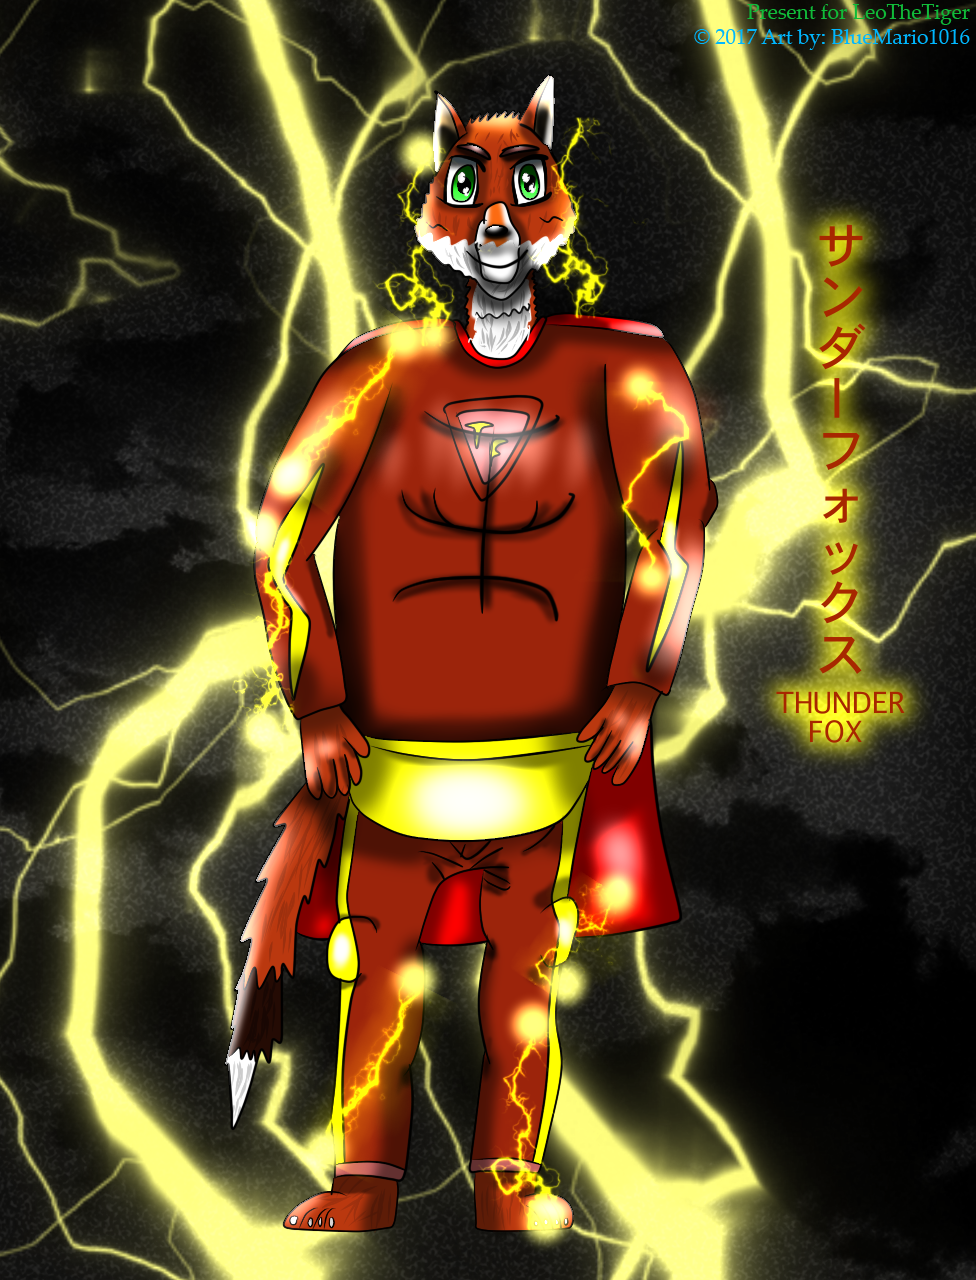 Most recent image: Thunder Fox